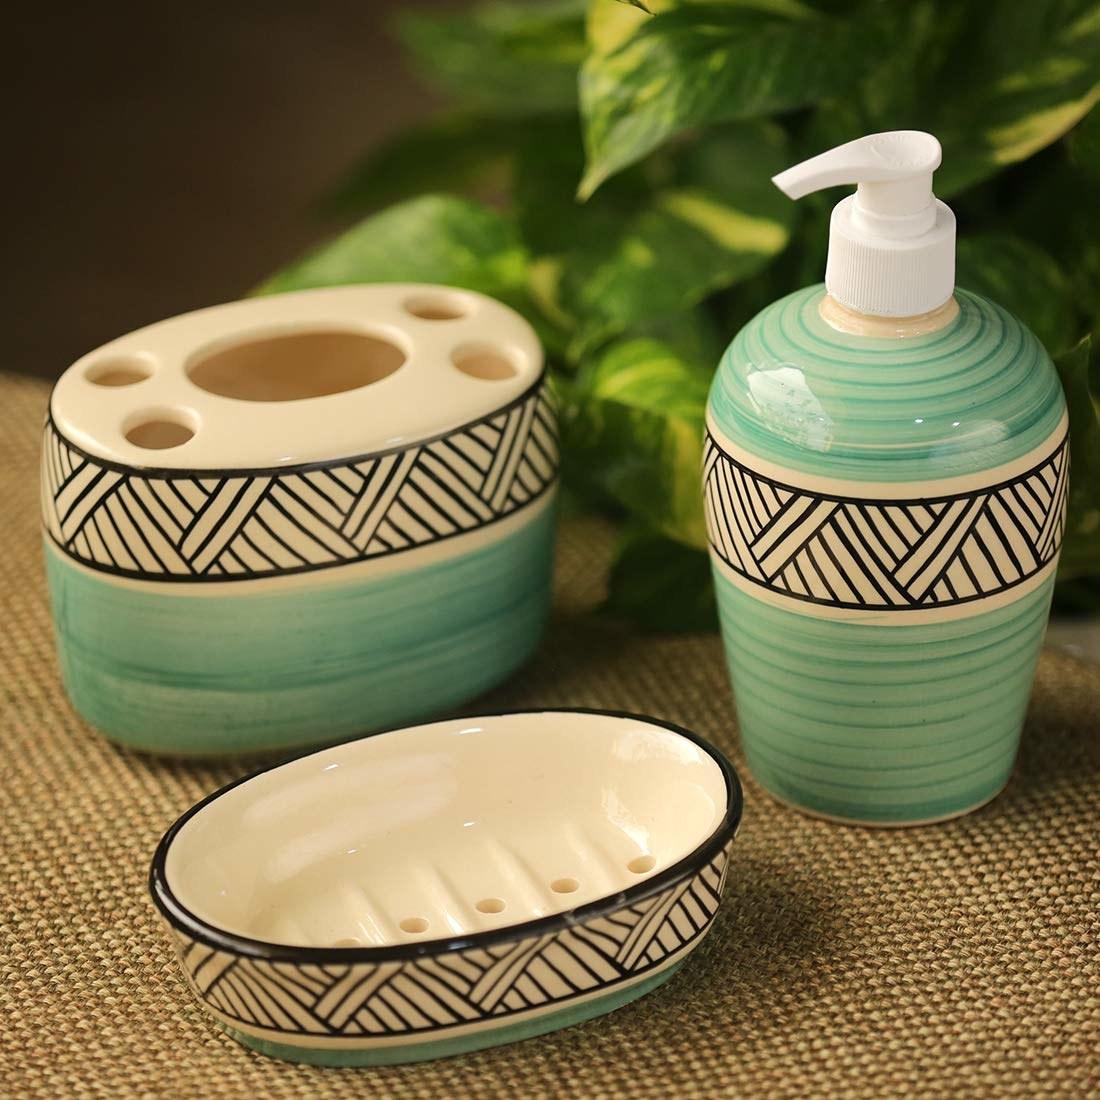 A bathroom accessories set